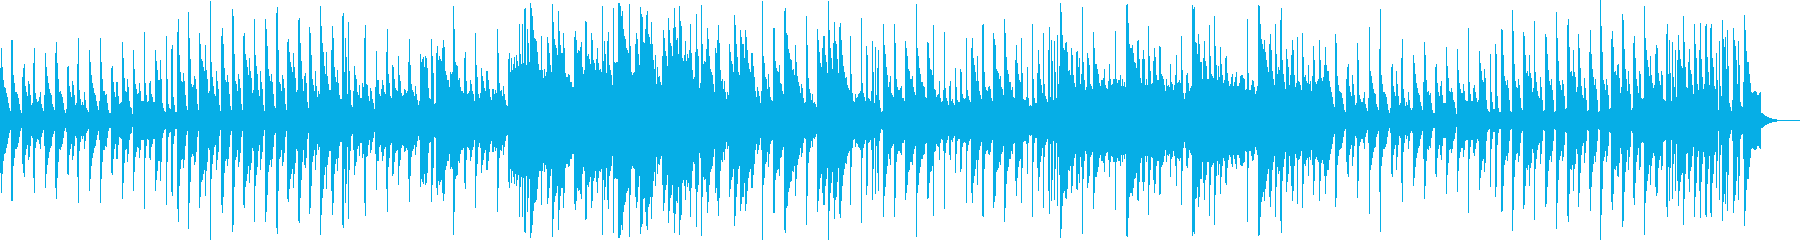 8bitメルヘン、コミカル 1コーラス版の再生済みの波形